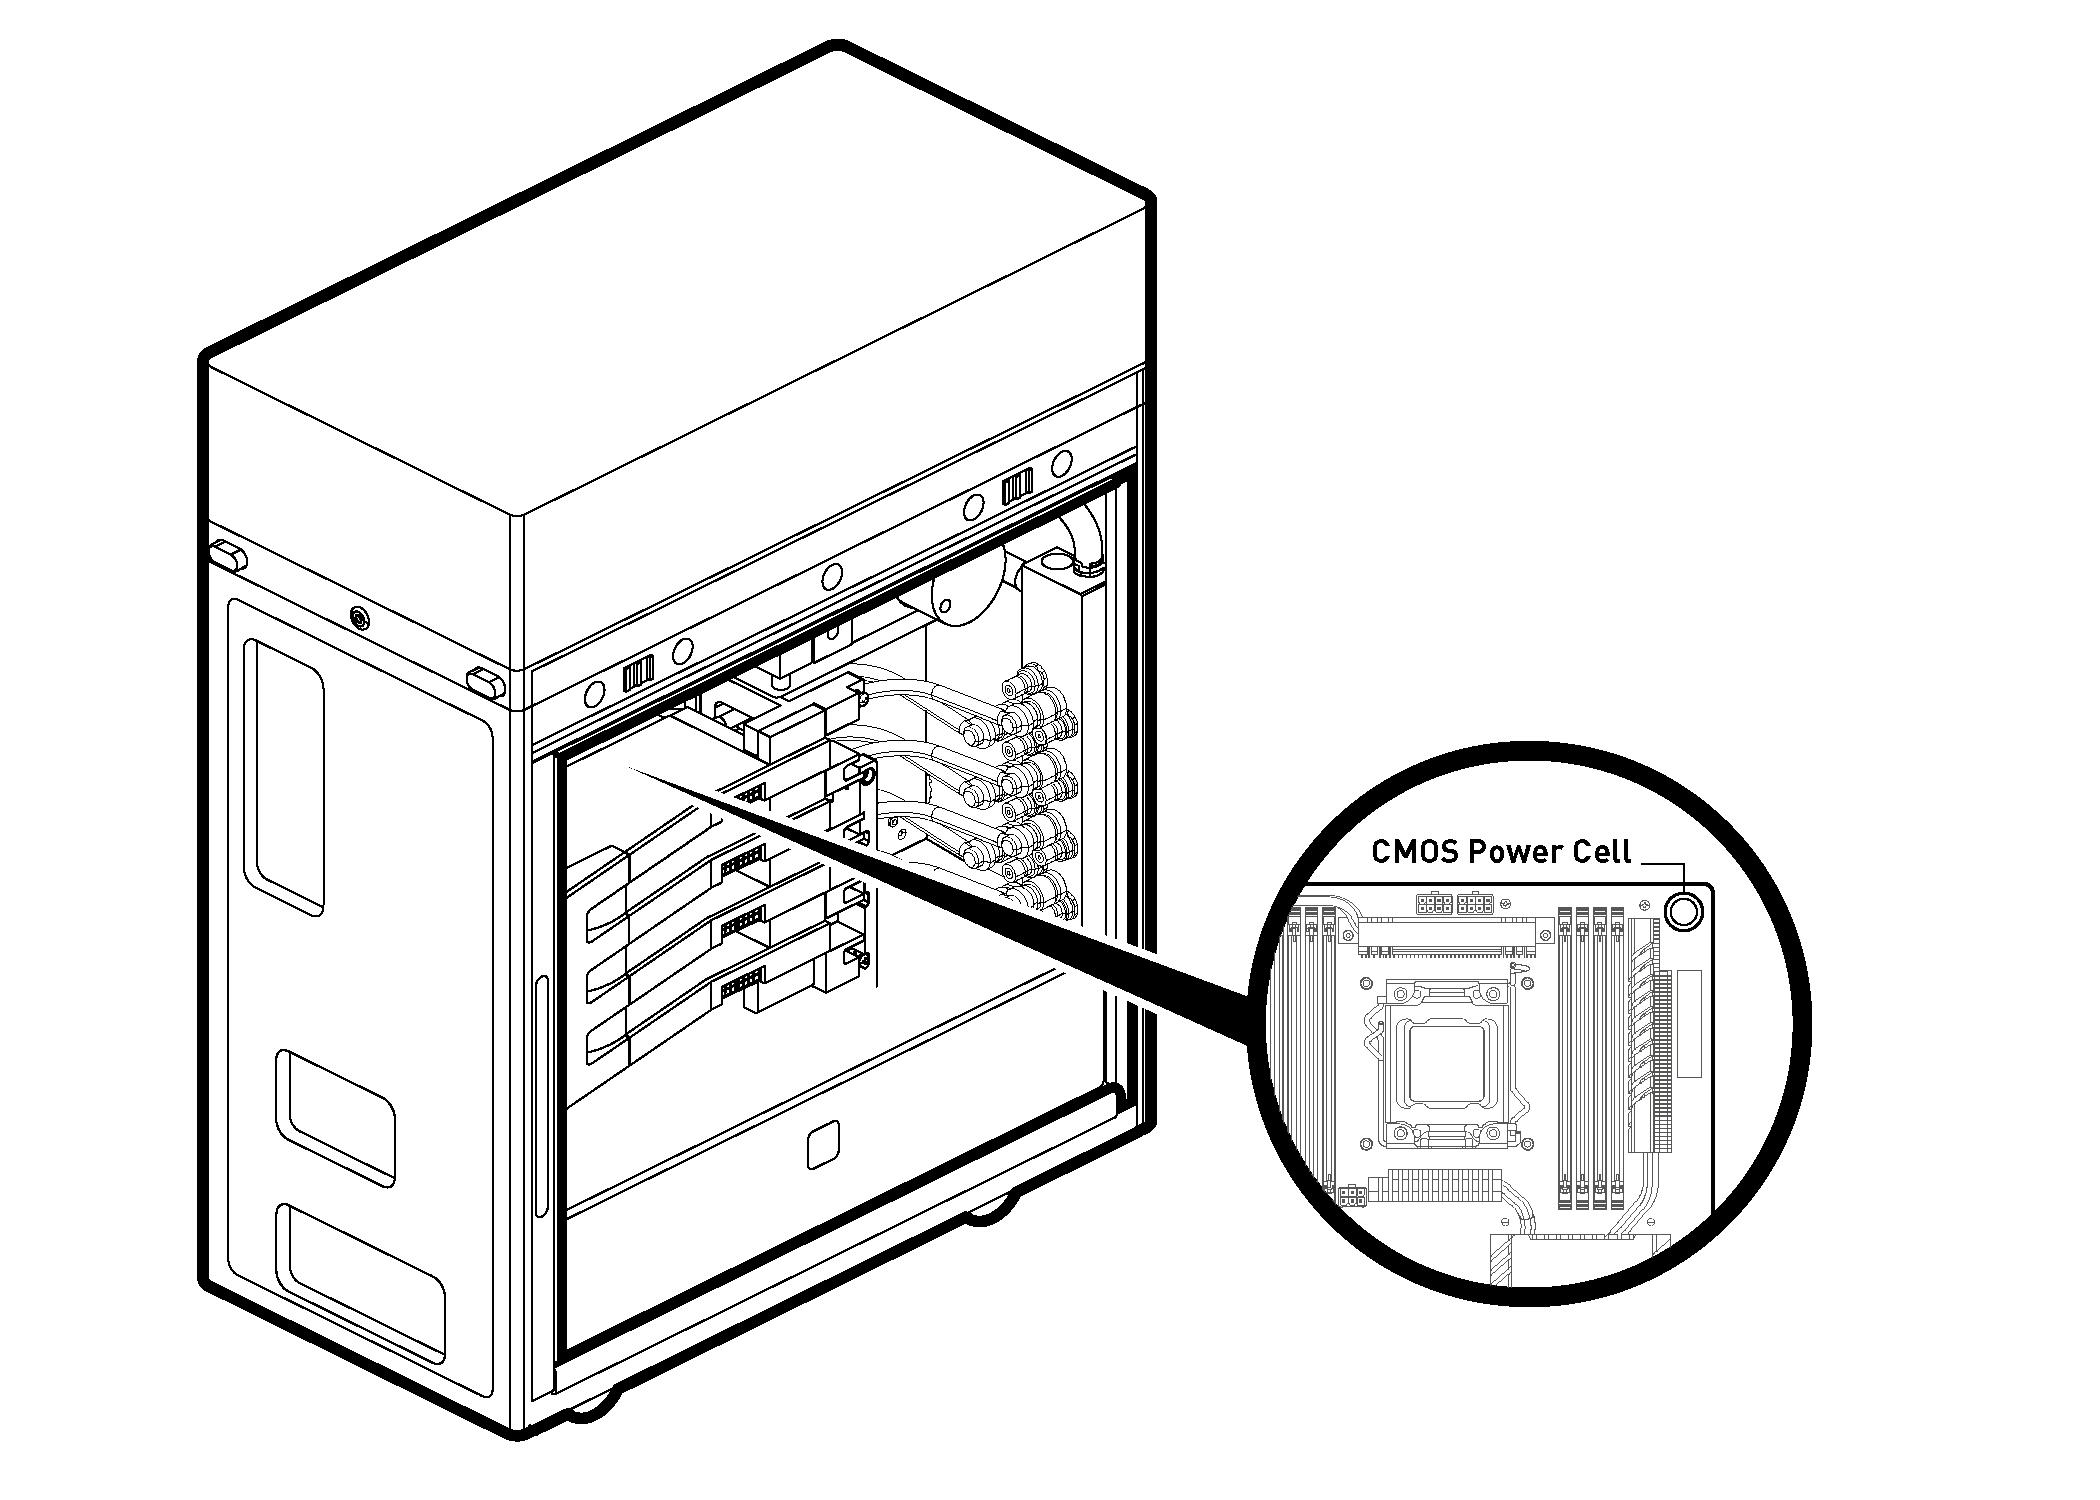 LF_1691] Ez 21 Wiring Instructions User Manual Guide Free DiagramDupl Astic Olyti Waro Apan Onica Swas Hylec Gritea Epsy Vira Mohammedshrine  Librar Wiring 101